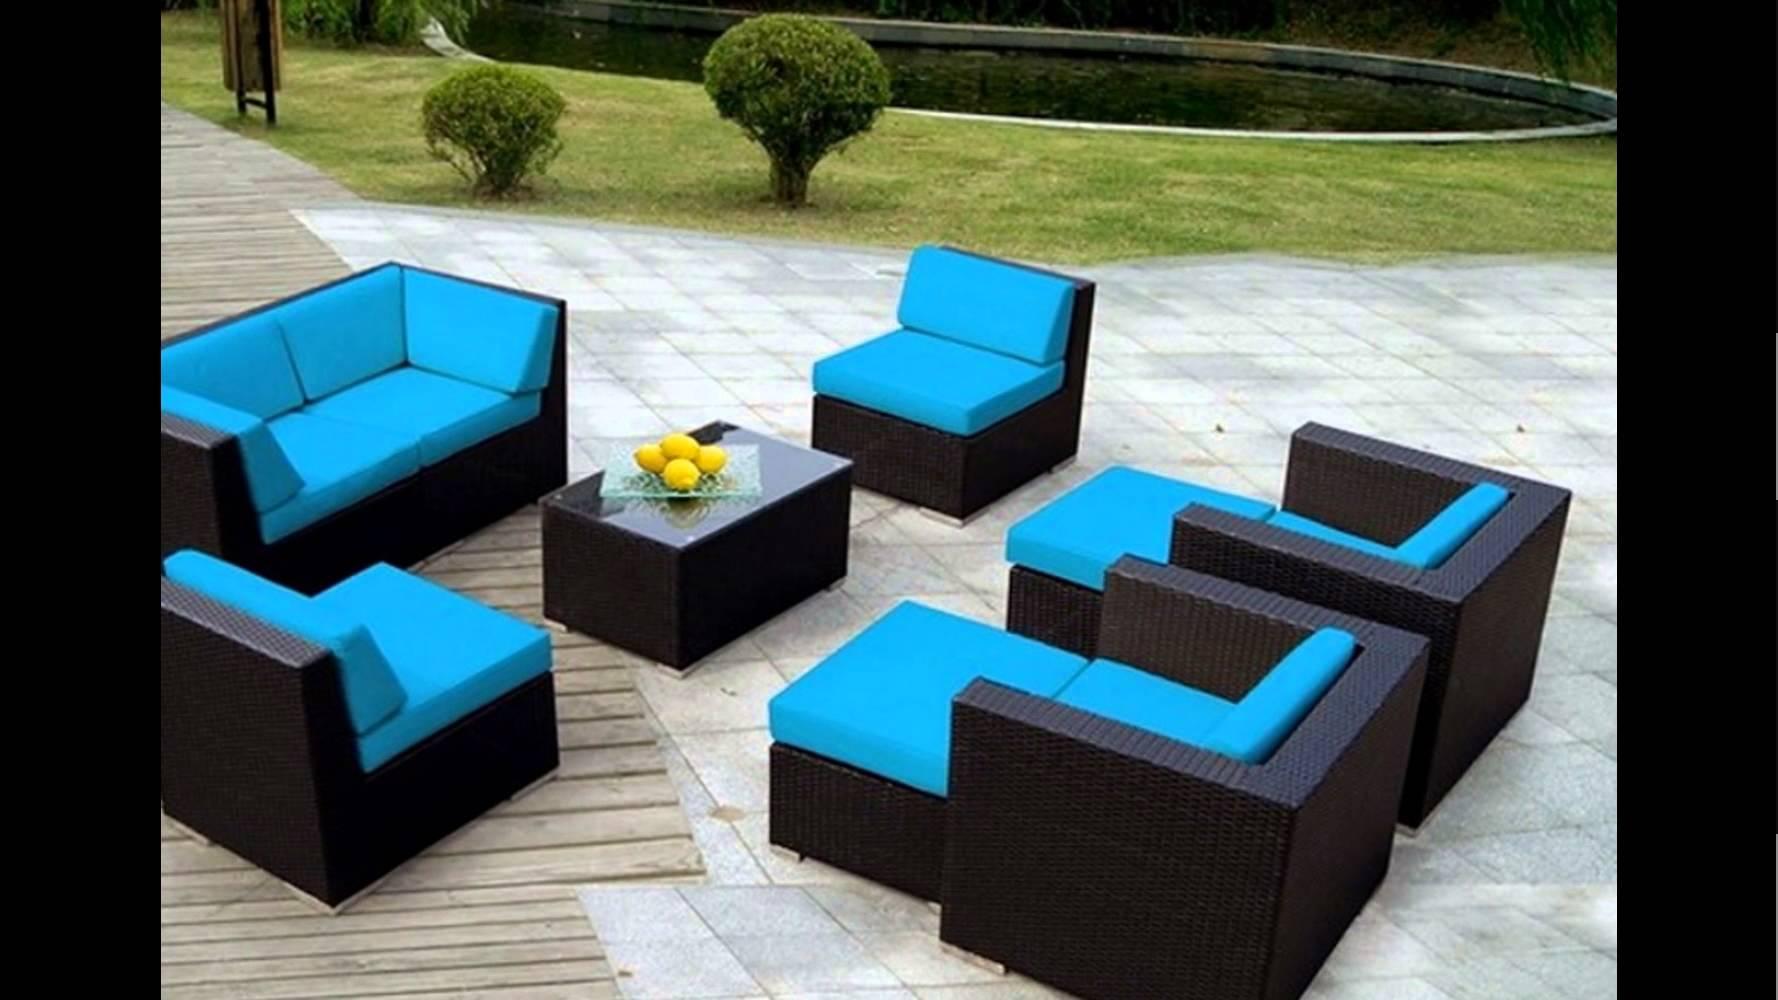 big lots outdoor furniture big lots patio furniture | patio furniture big lots | big lots TPXDXTJ